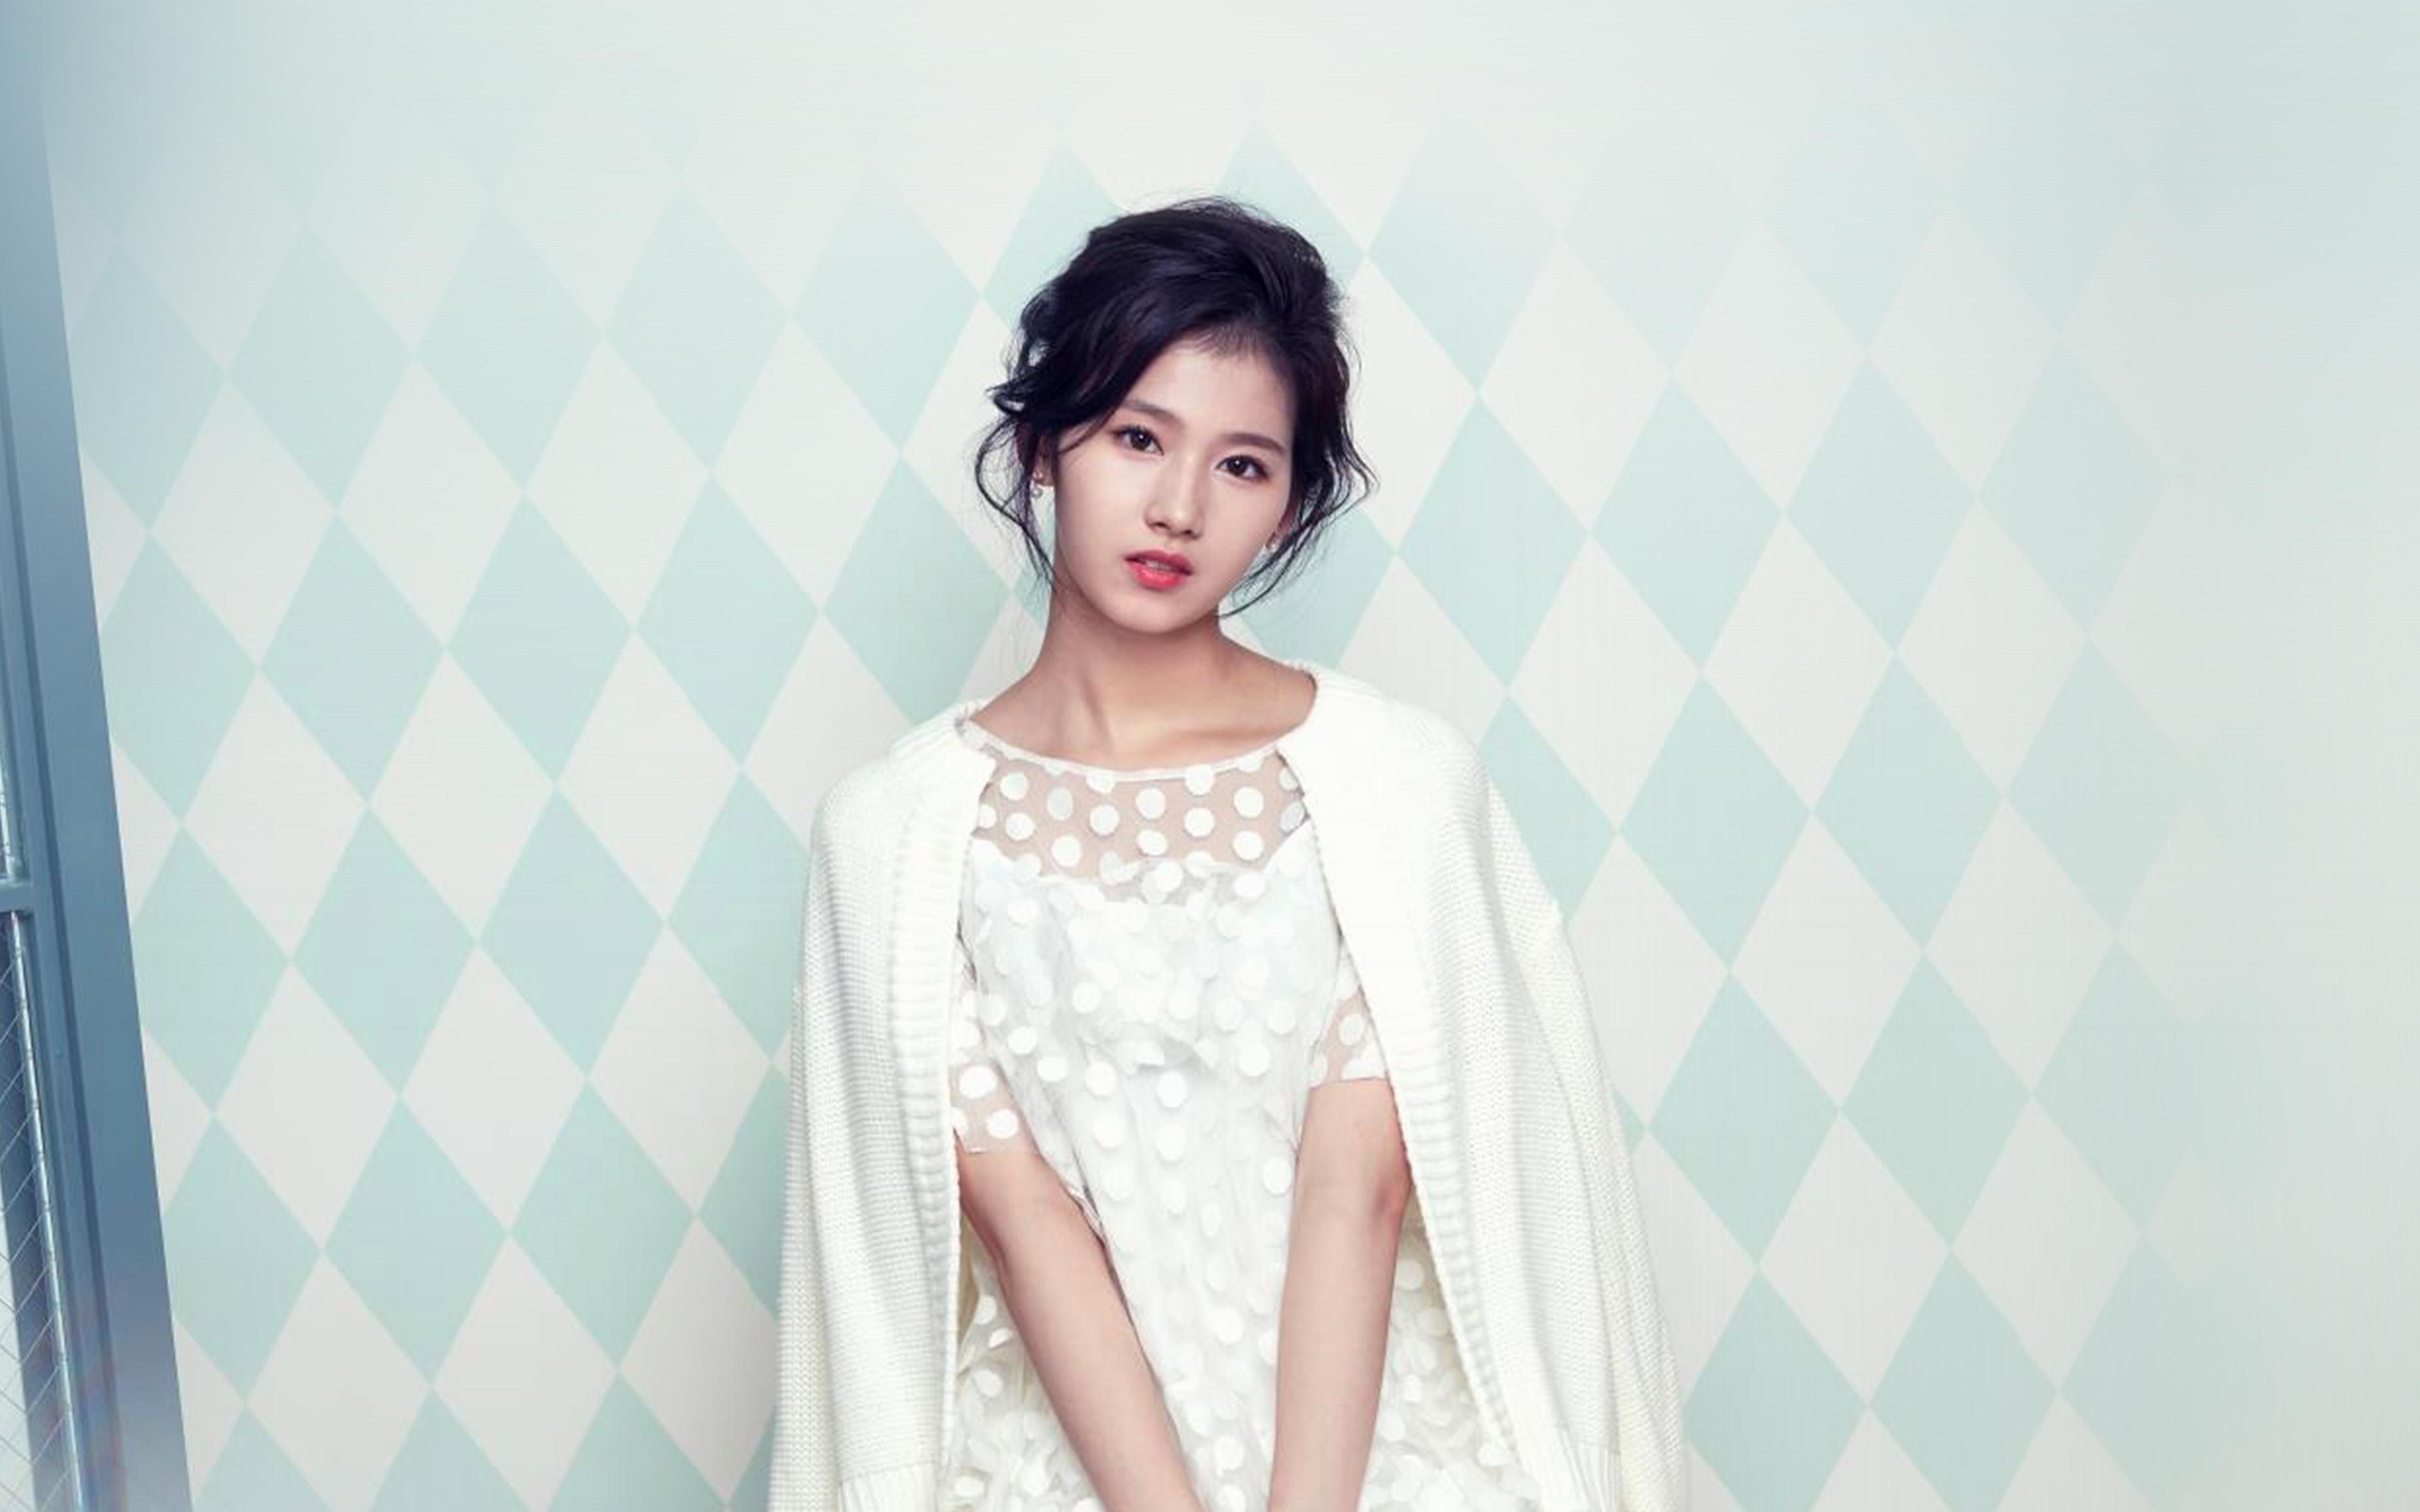 Cute Korean Girl Wallpaper Hn62 Sana Girl Kpop Twice Wallpaper